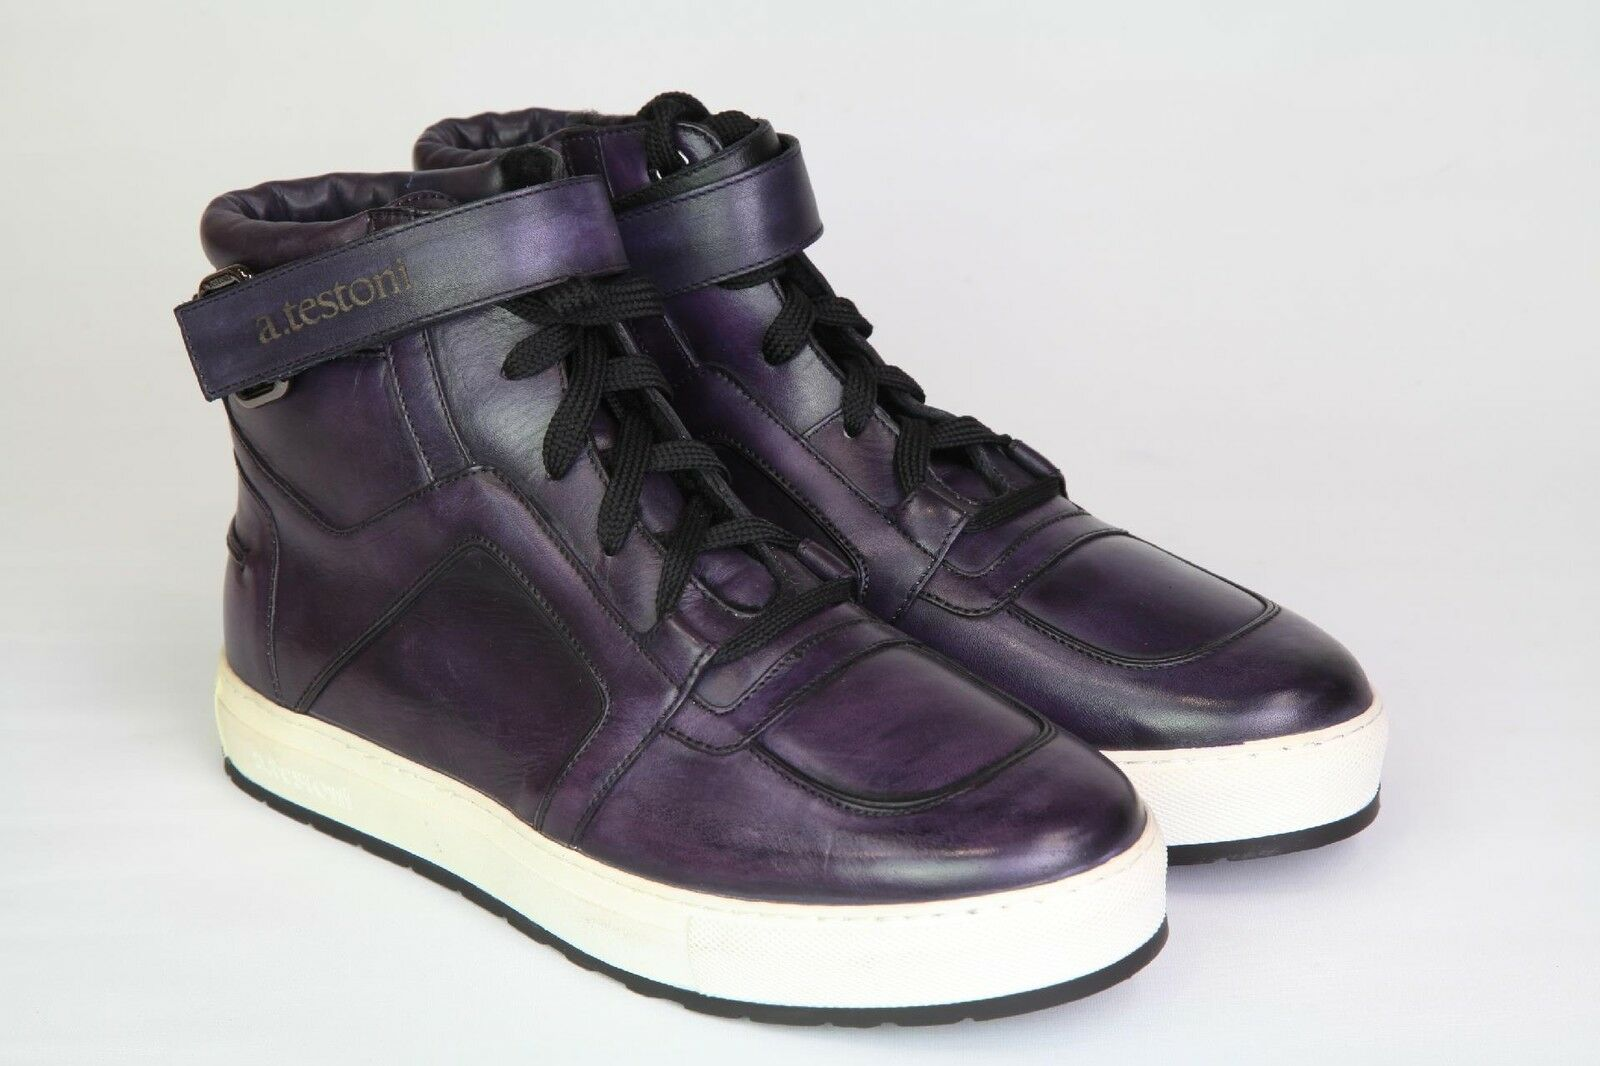 A. Testoni Para Hombres Zapatos Tenis nos altas púrpura 8 nos Tenis 42 Nuevo 6a96f5